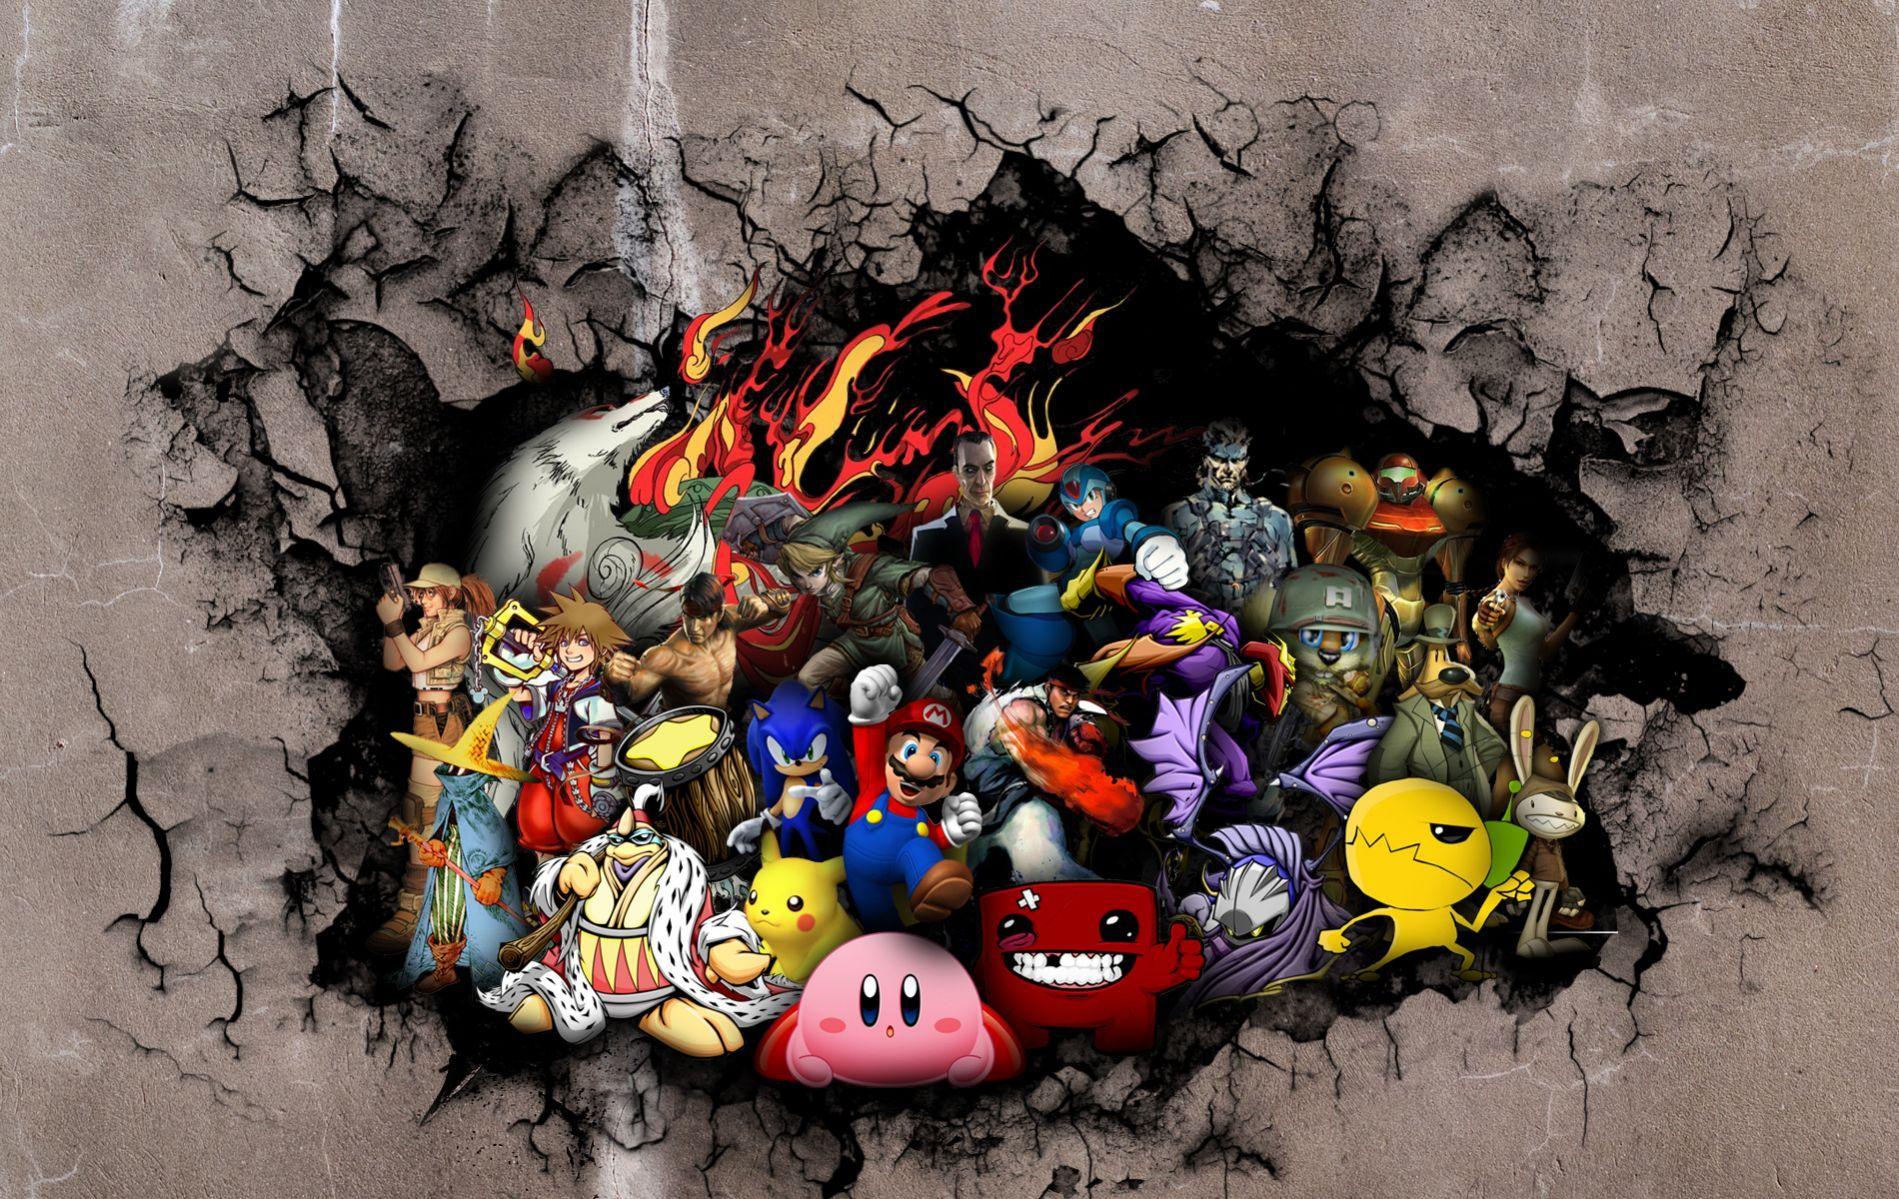 video game collage wallpaper dromhib.top Wallpaper